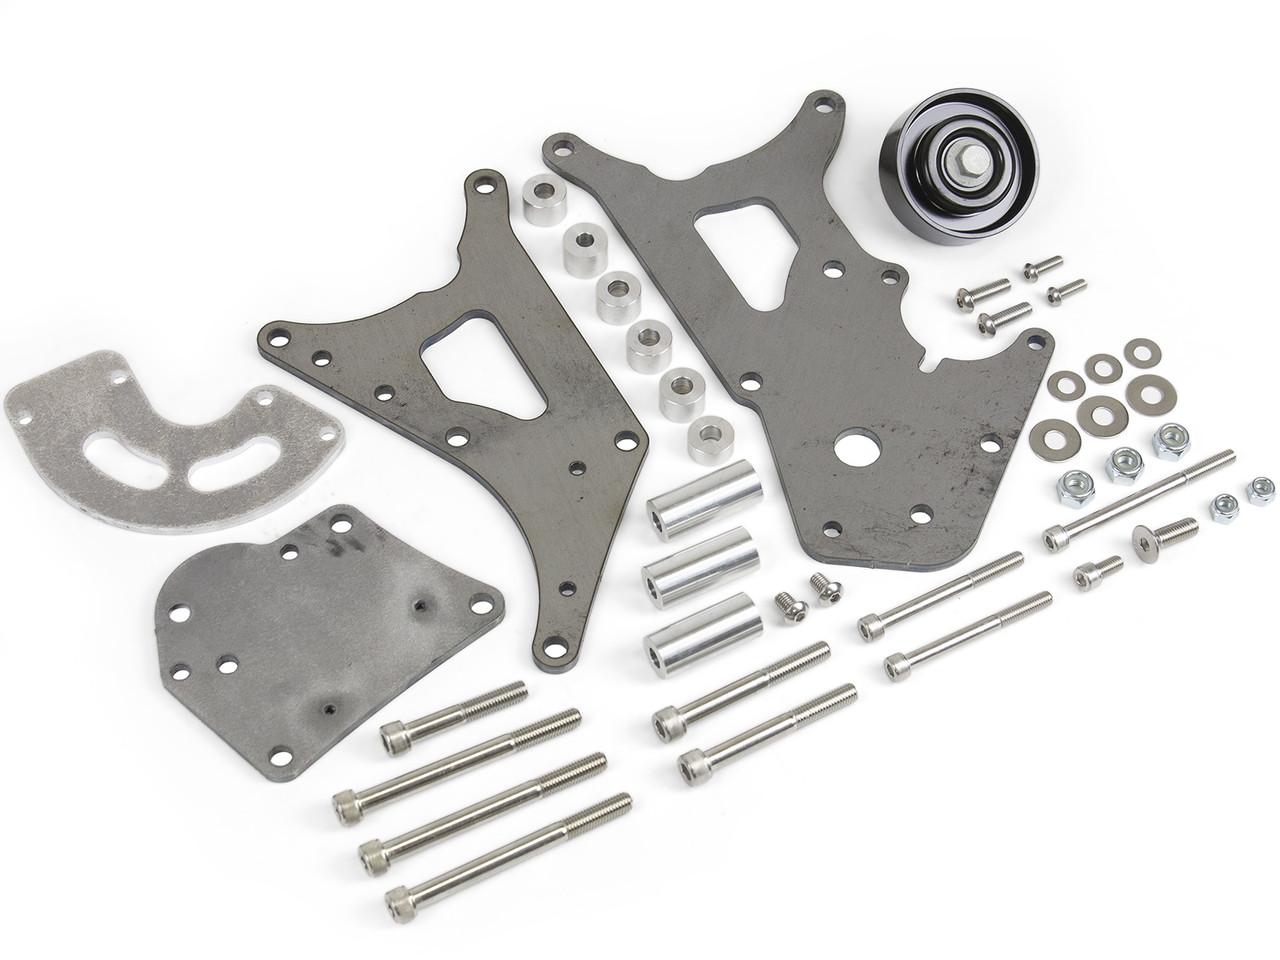 LS Engine Accessory Bracket Mounting Kit